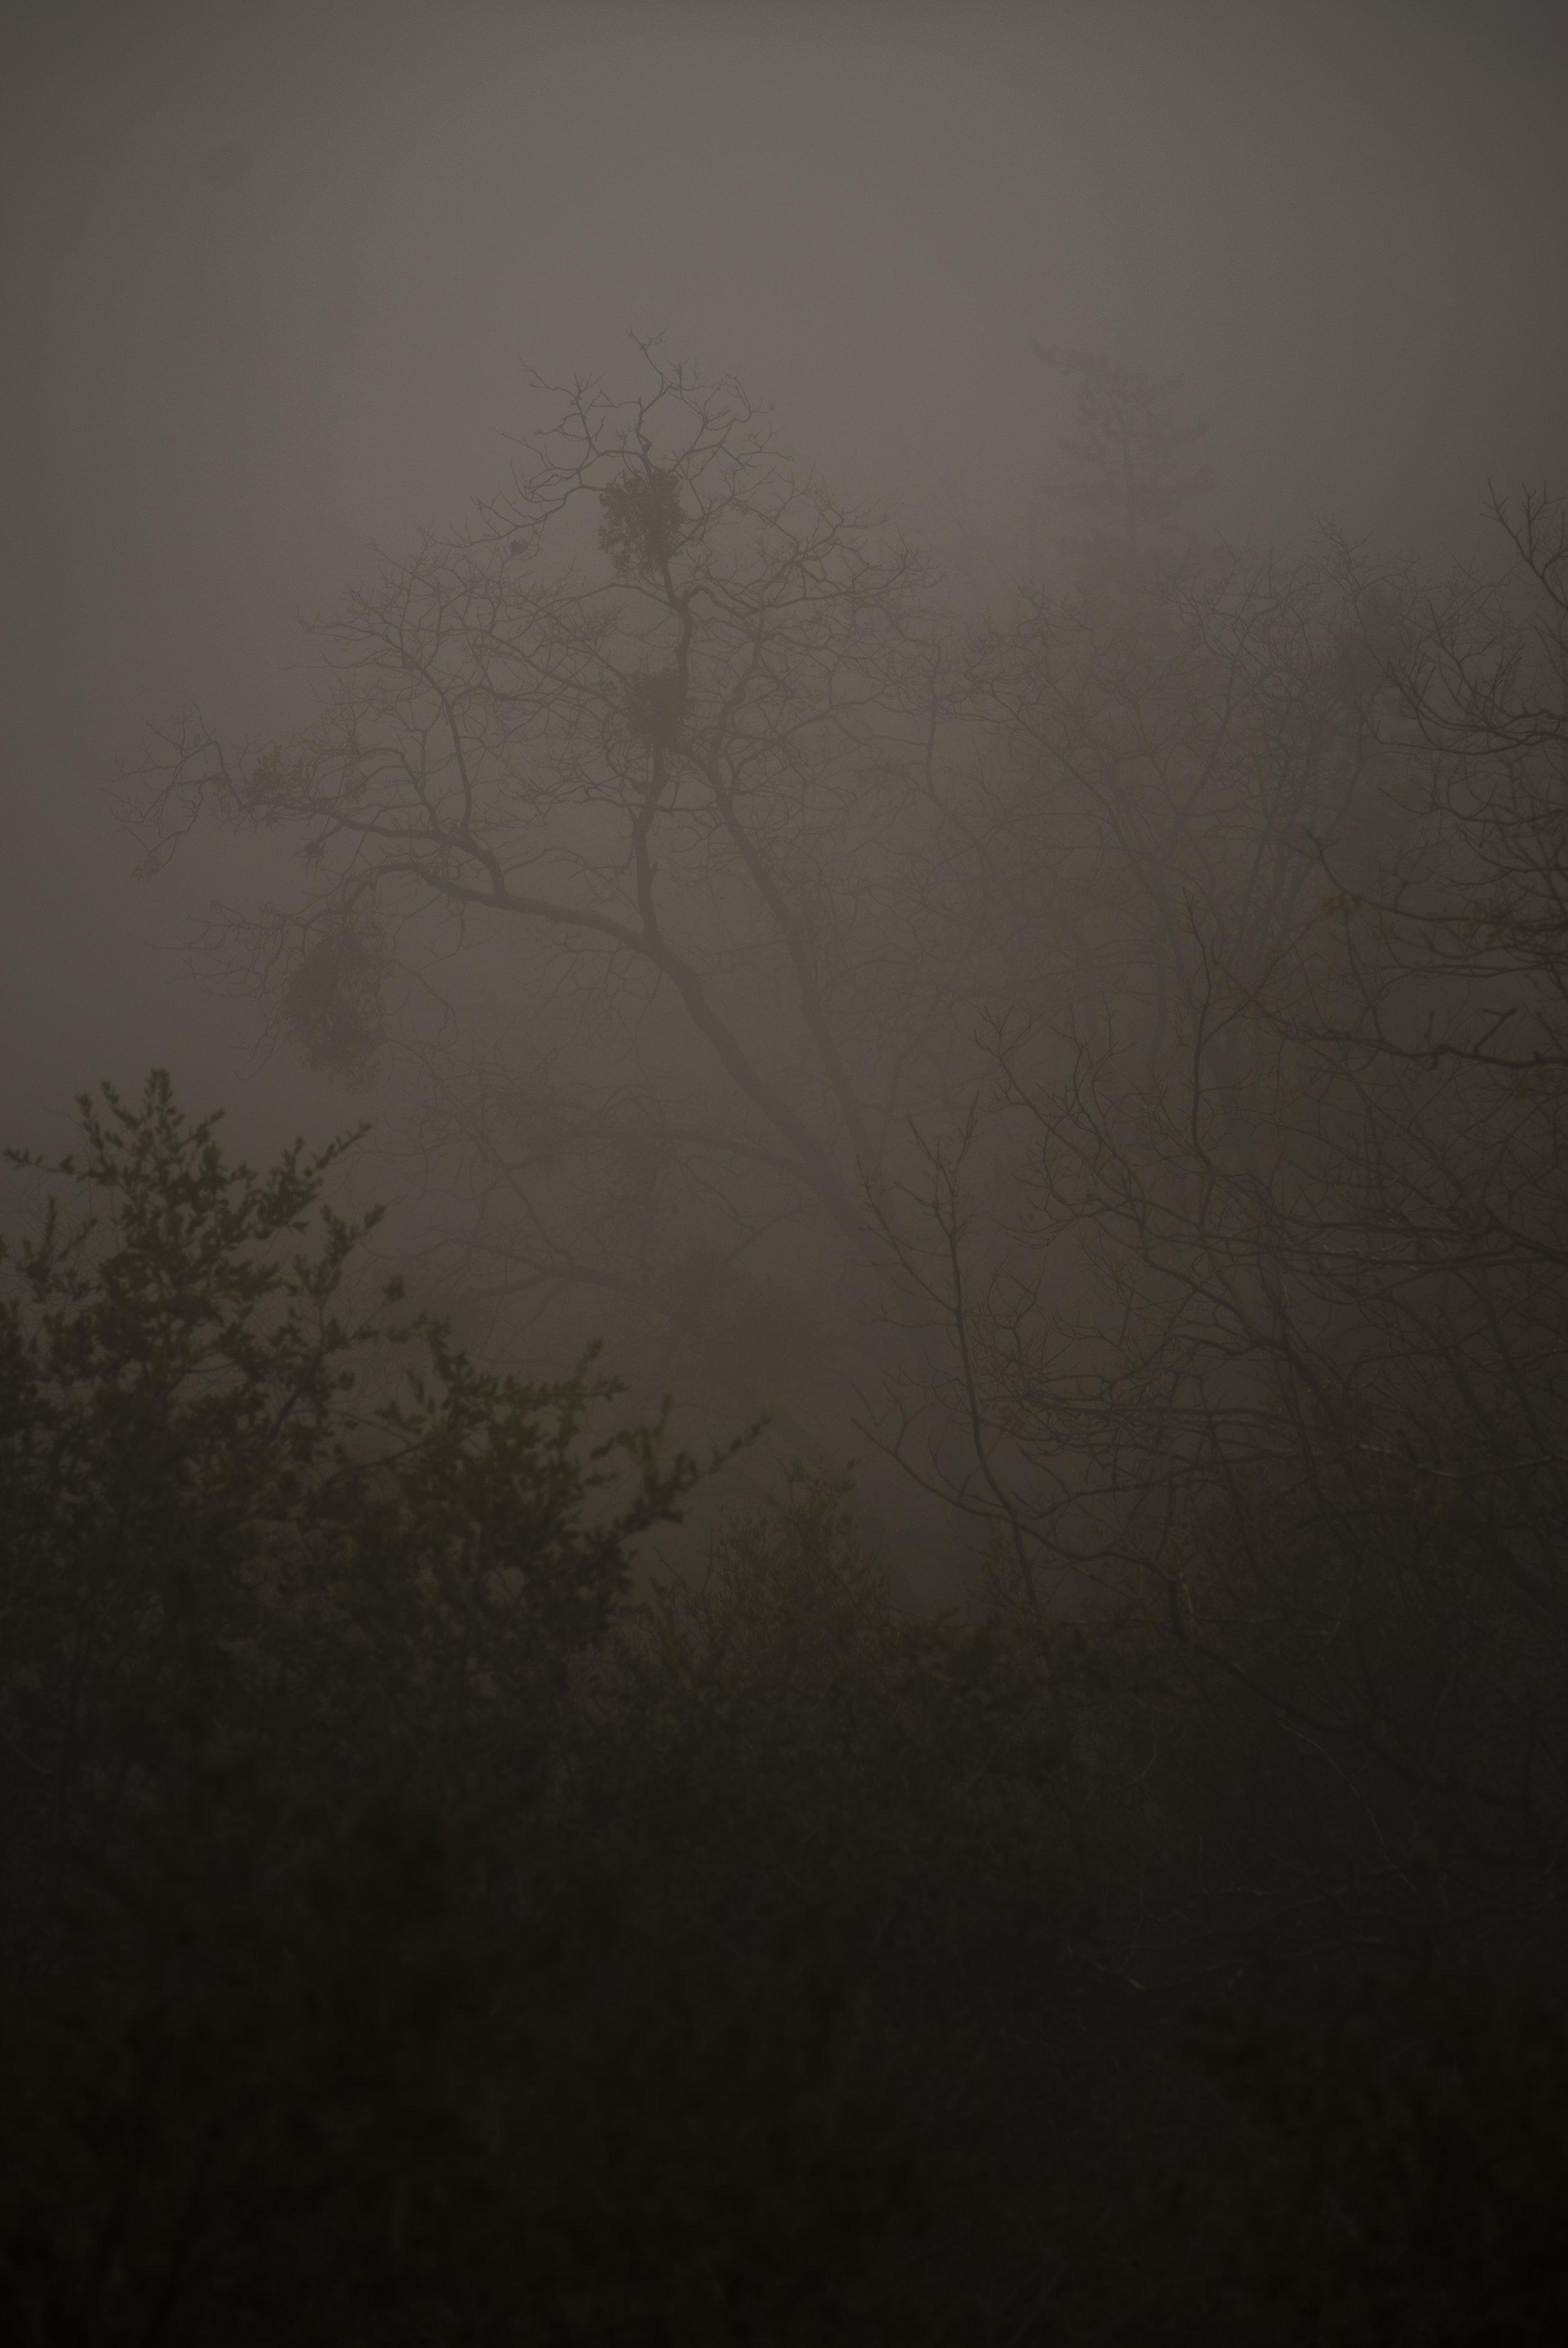 More Spooky Fog!